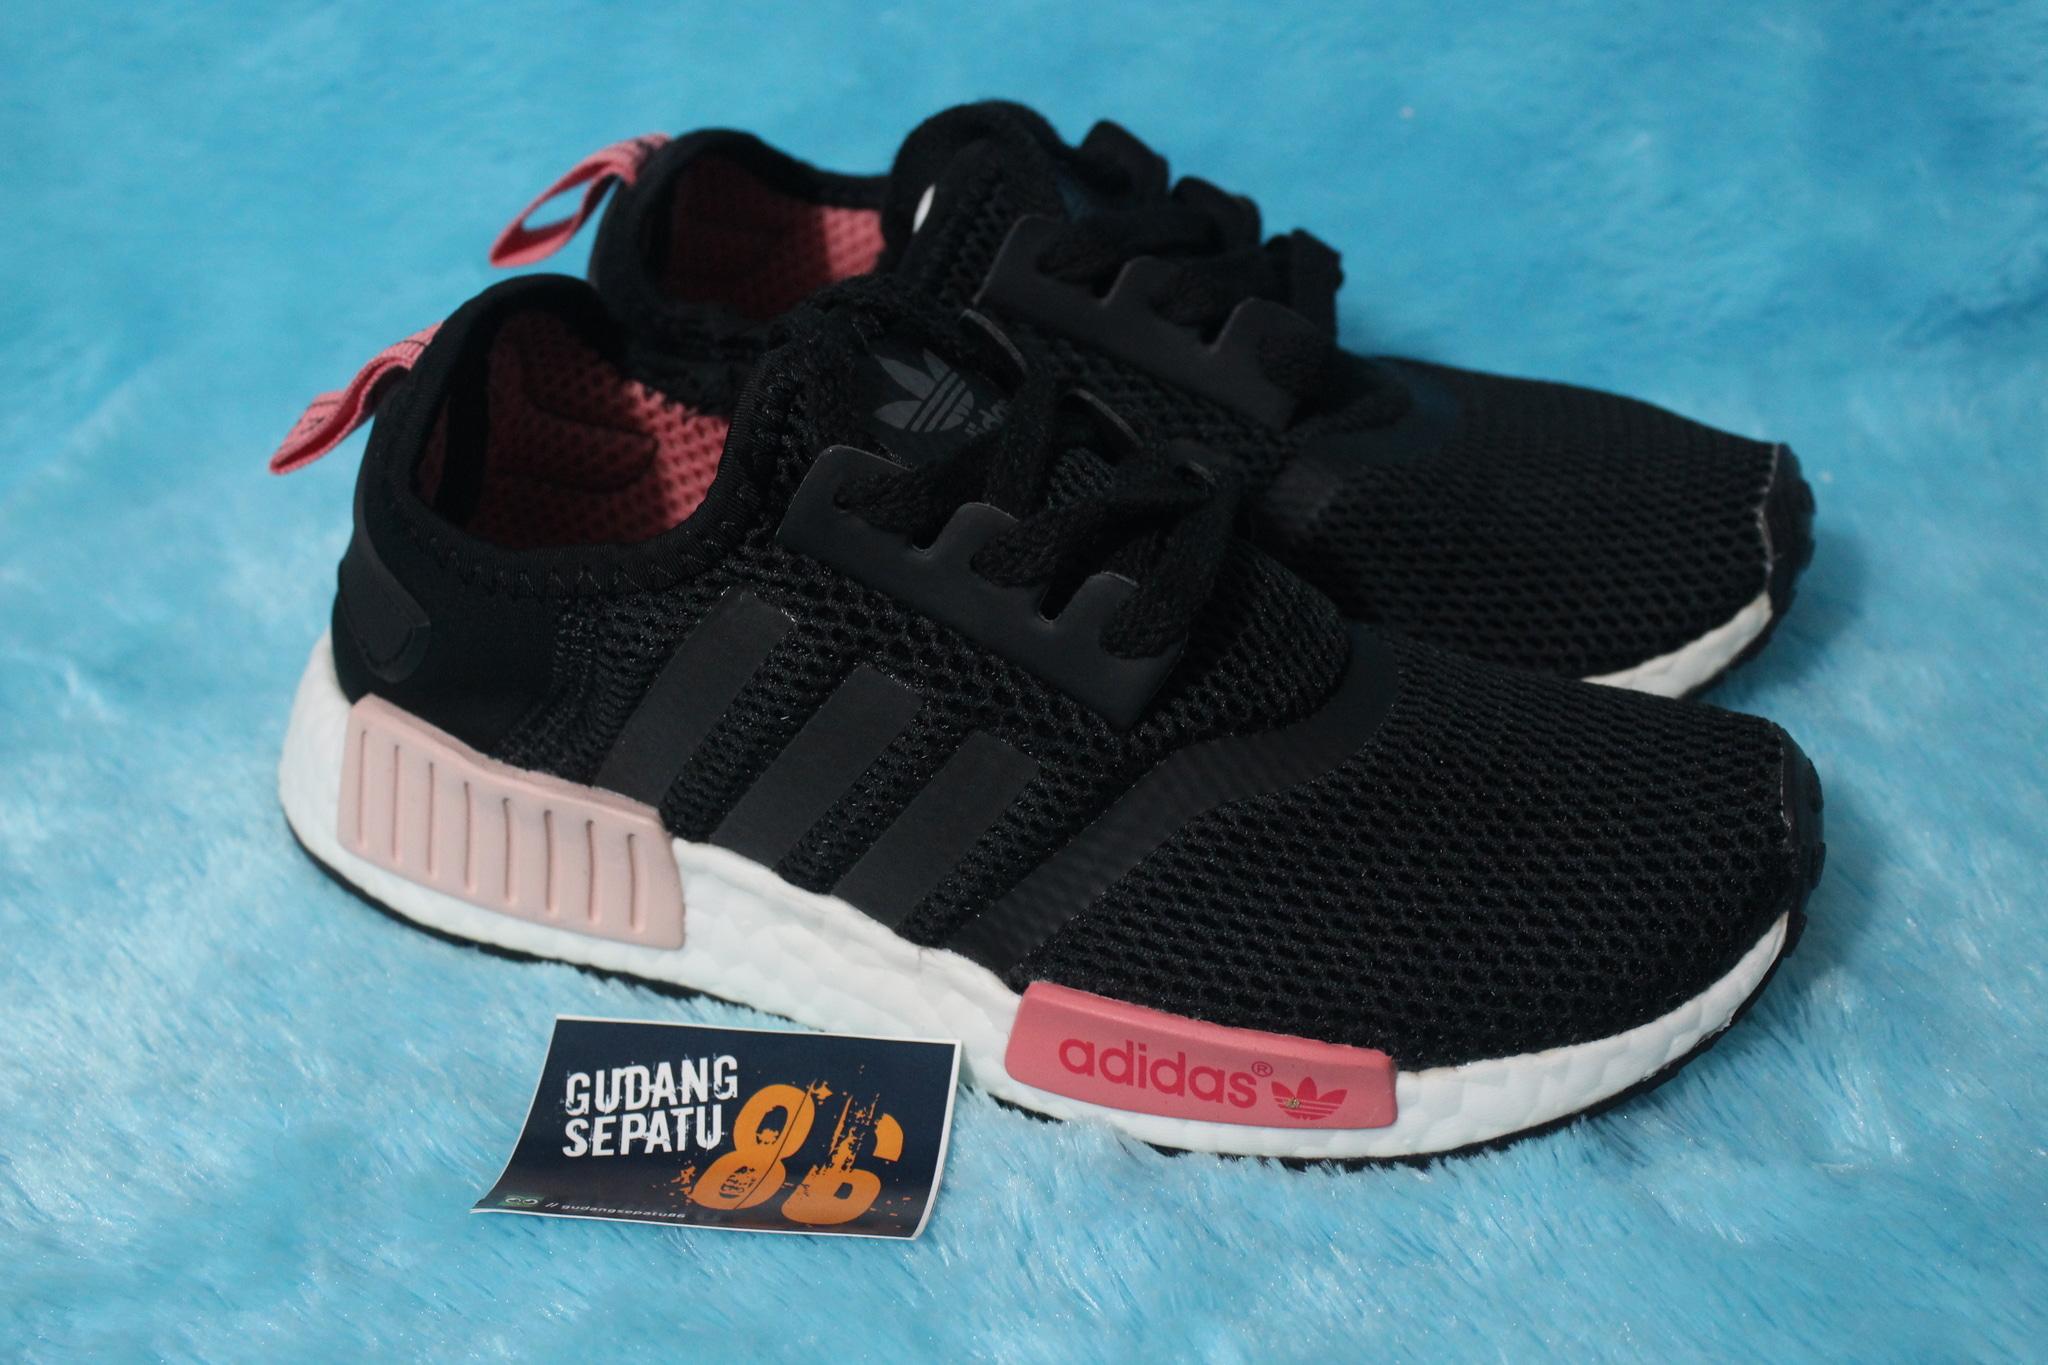 258321cb56127 Jual Sepatu Adidas NMD R1 Black Core Peach Pink Womens - Premium Quality -  Gudang Sepatu86